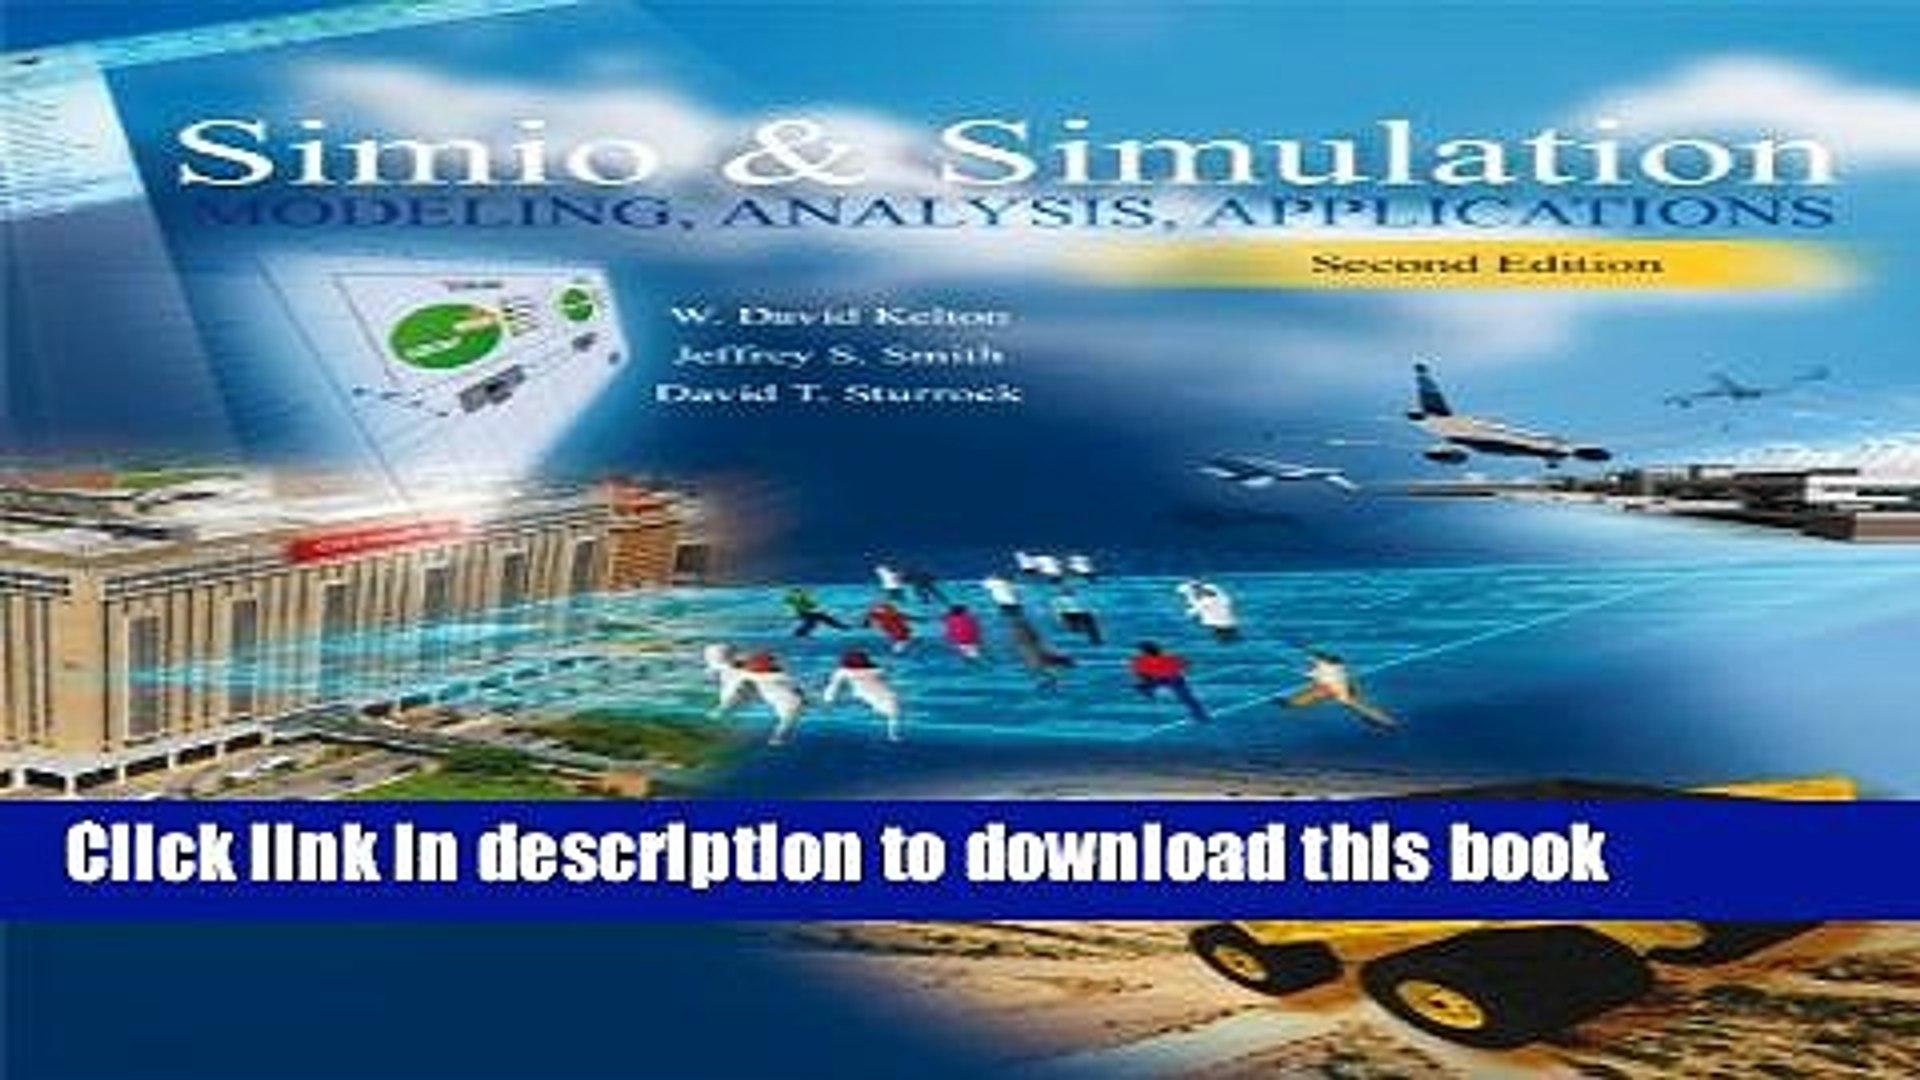 Ebook LSC  (UNIV OF CINCINNATI CINCINNATI) Simio and Simulation:   Modeling, Analysis,